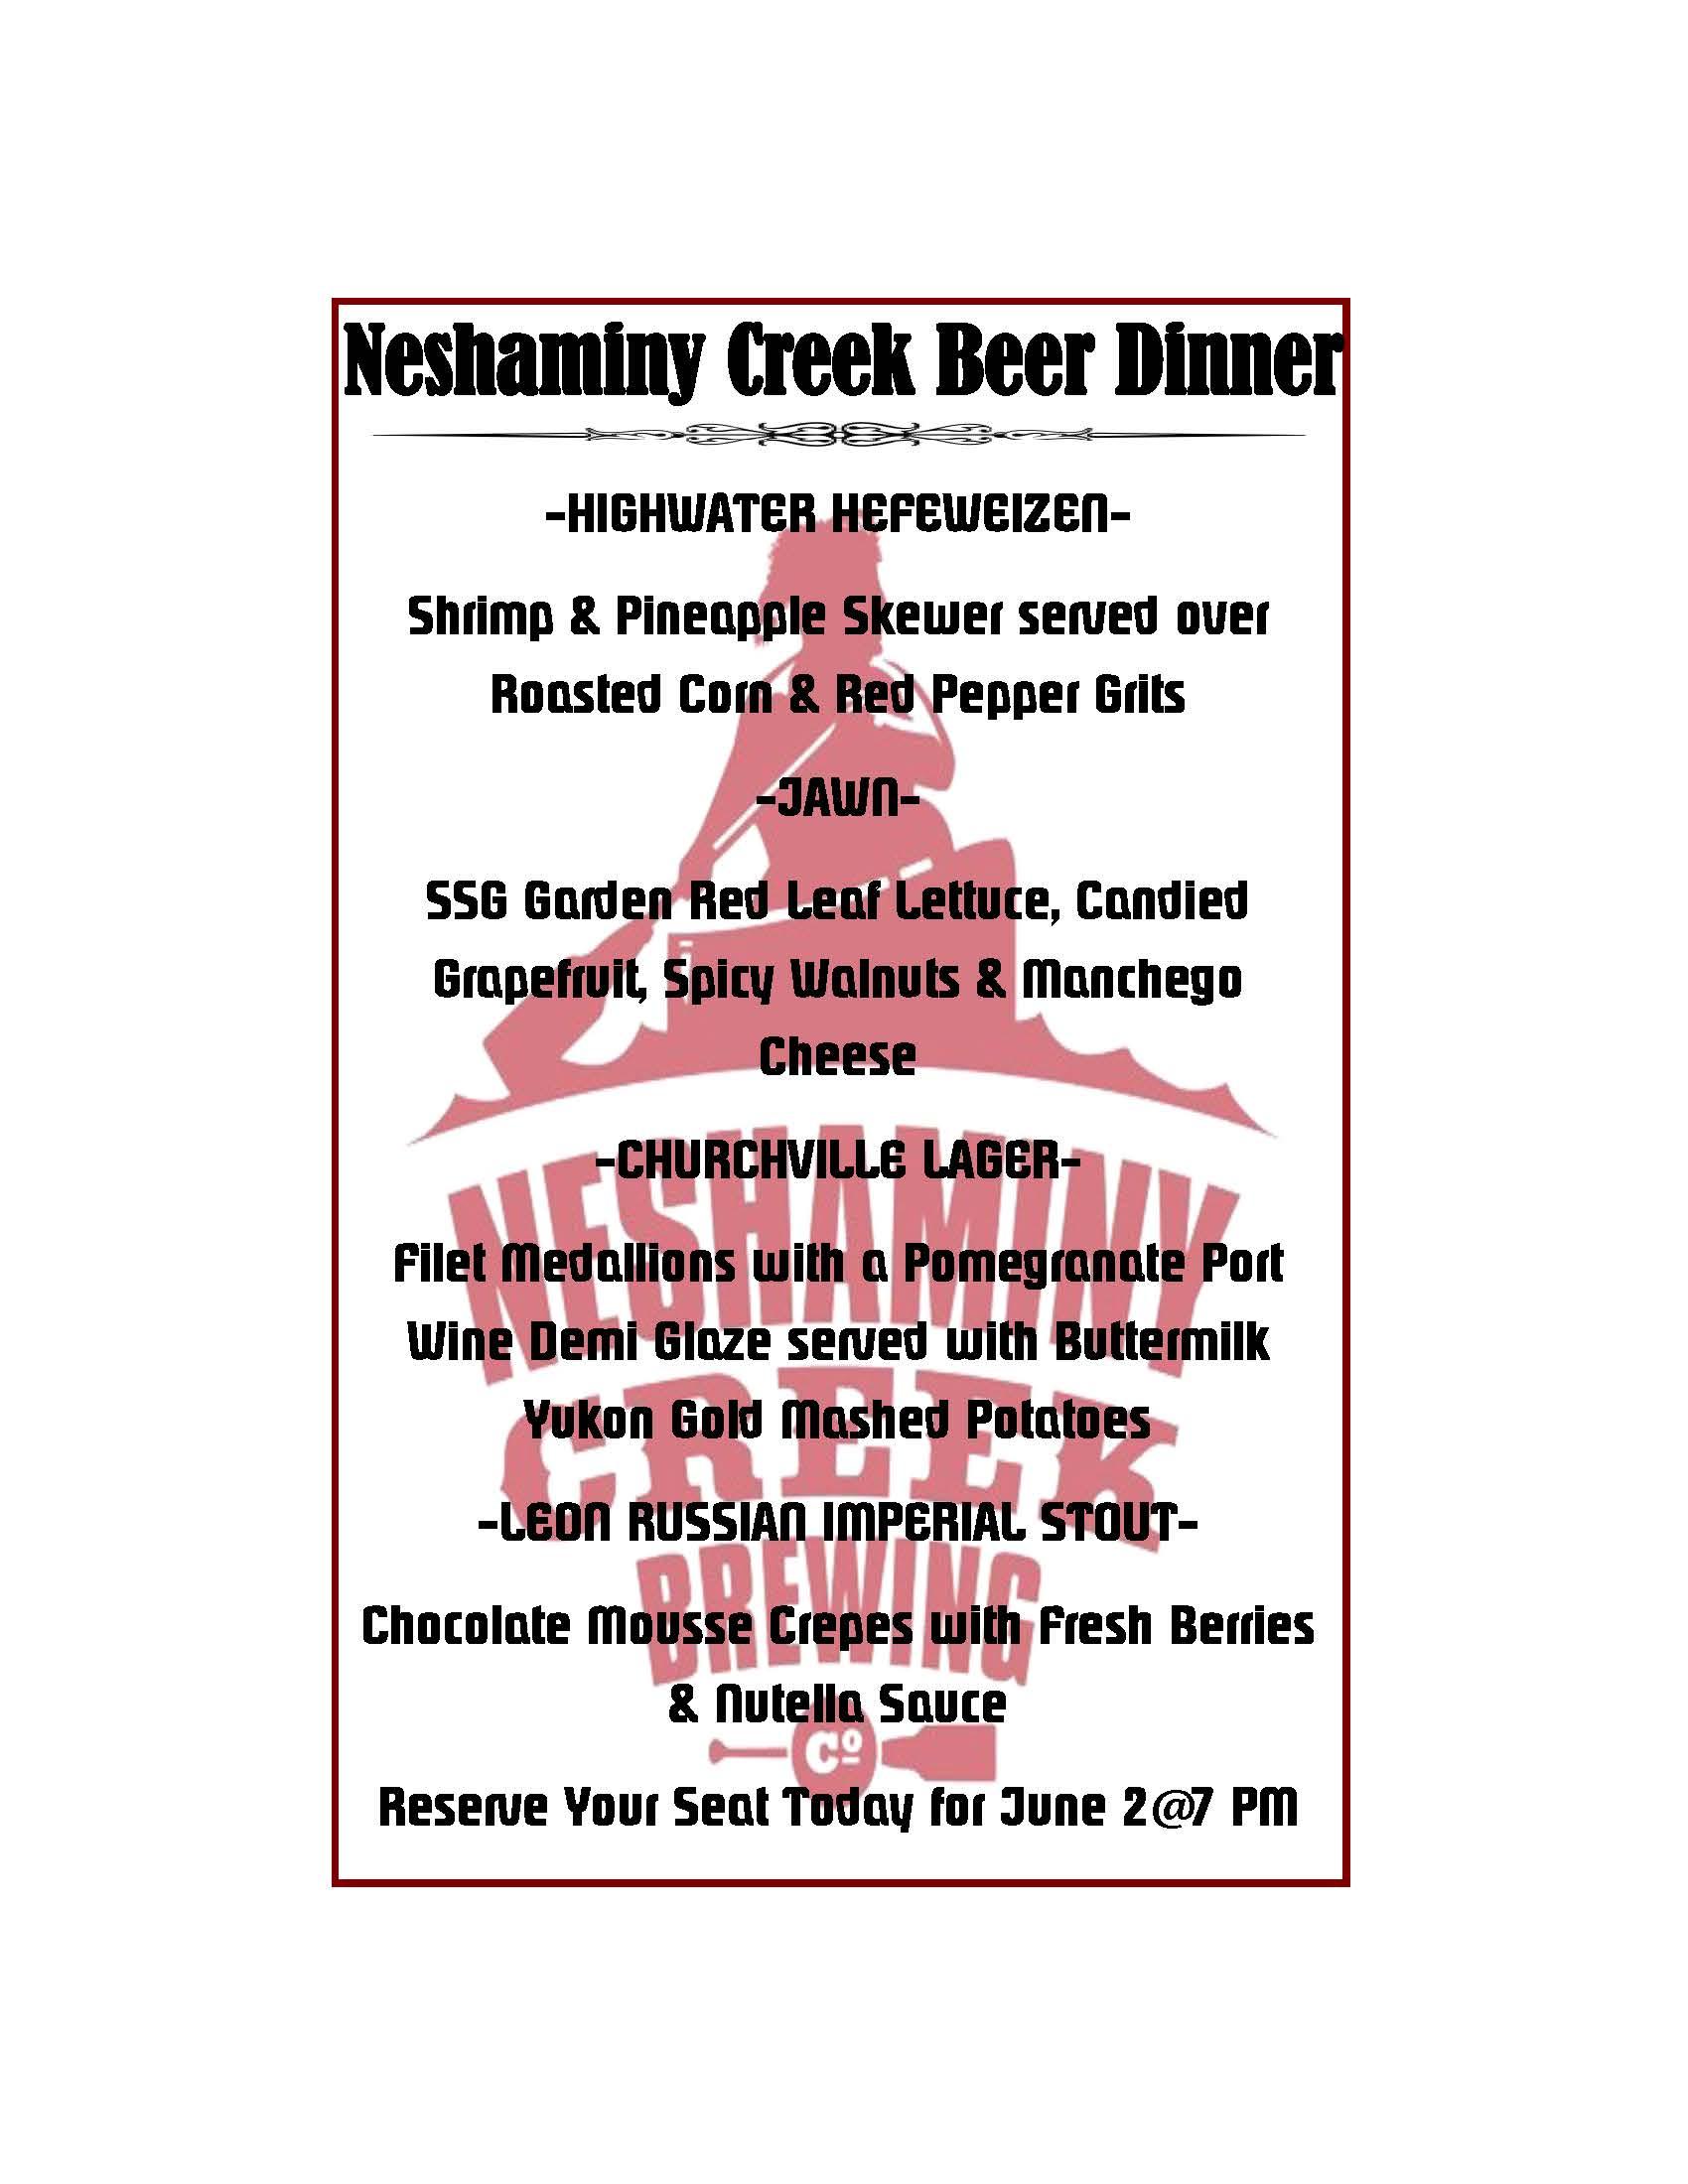 neshaminy creek dinner menu